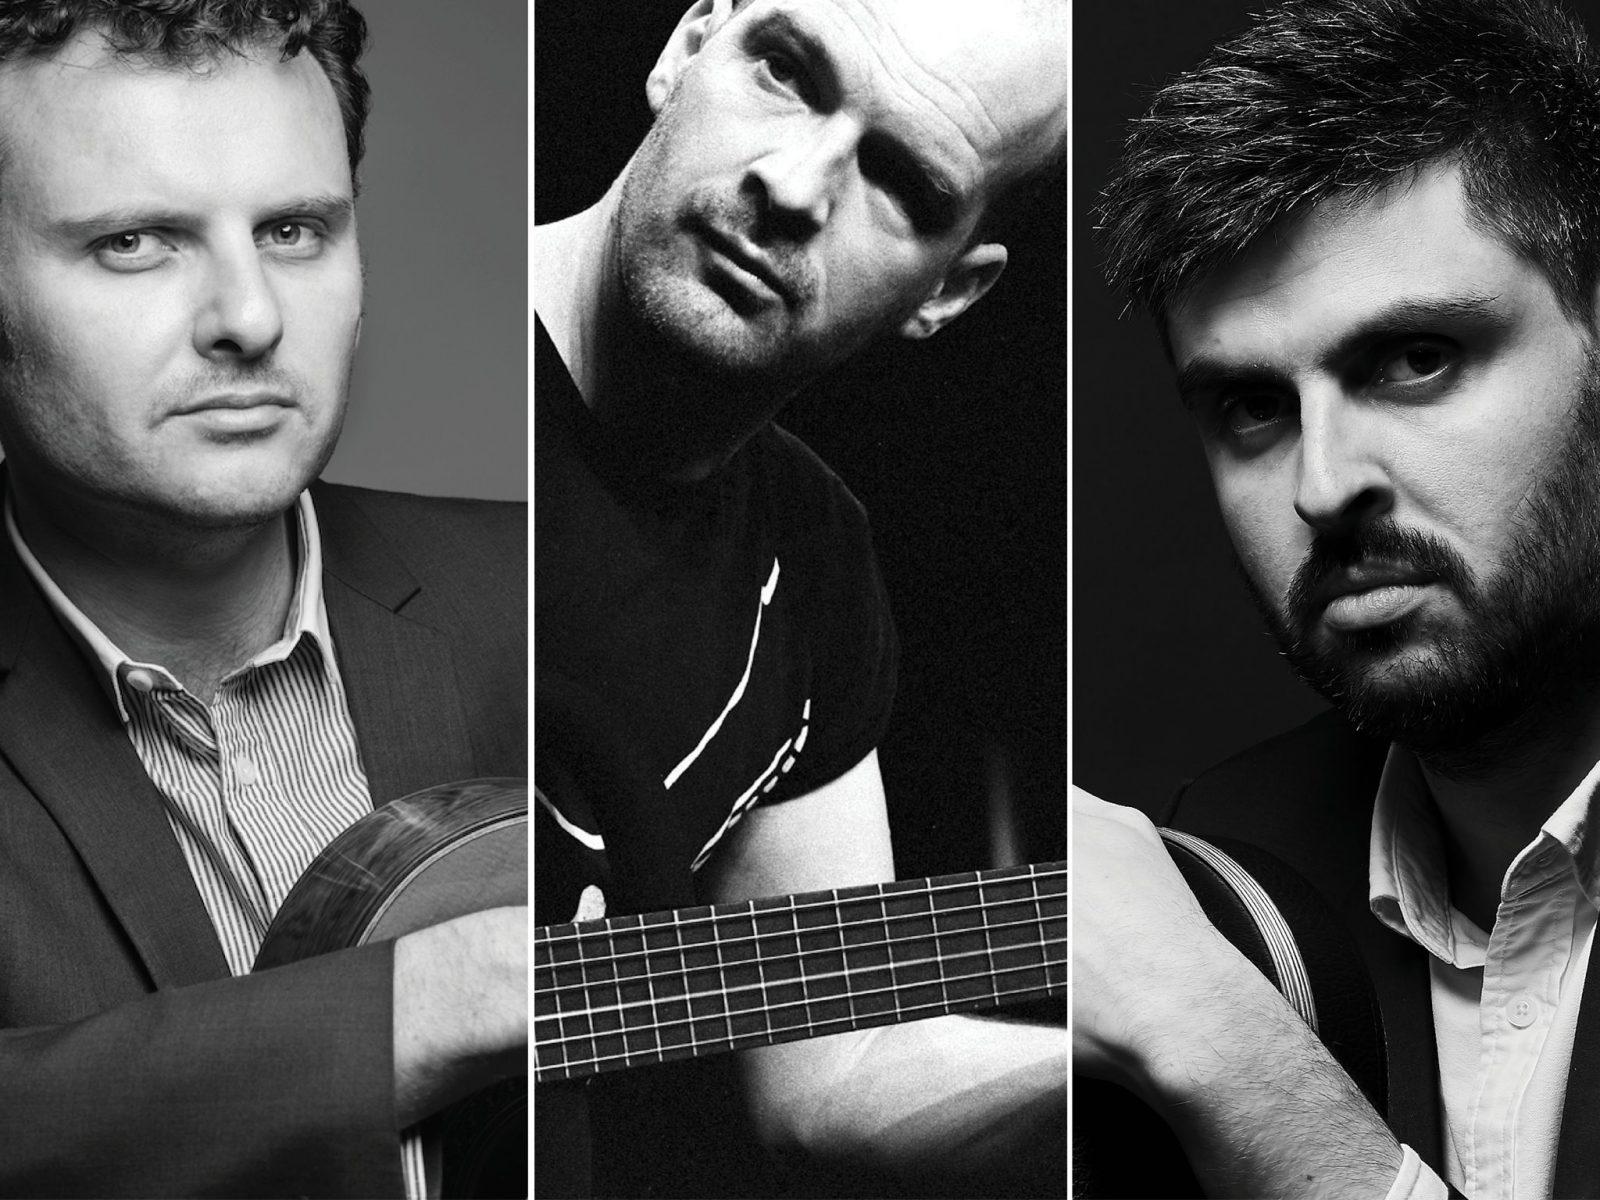 Headshots of Slava Grigoryan, Wolfgang Muthspiel and Leonard Grigoryan